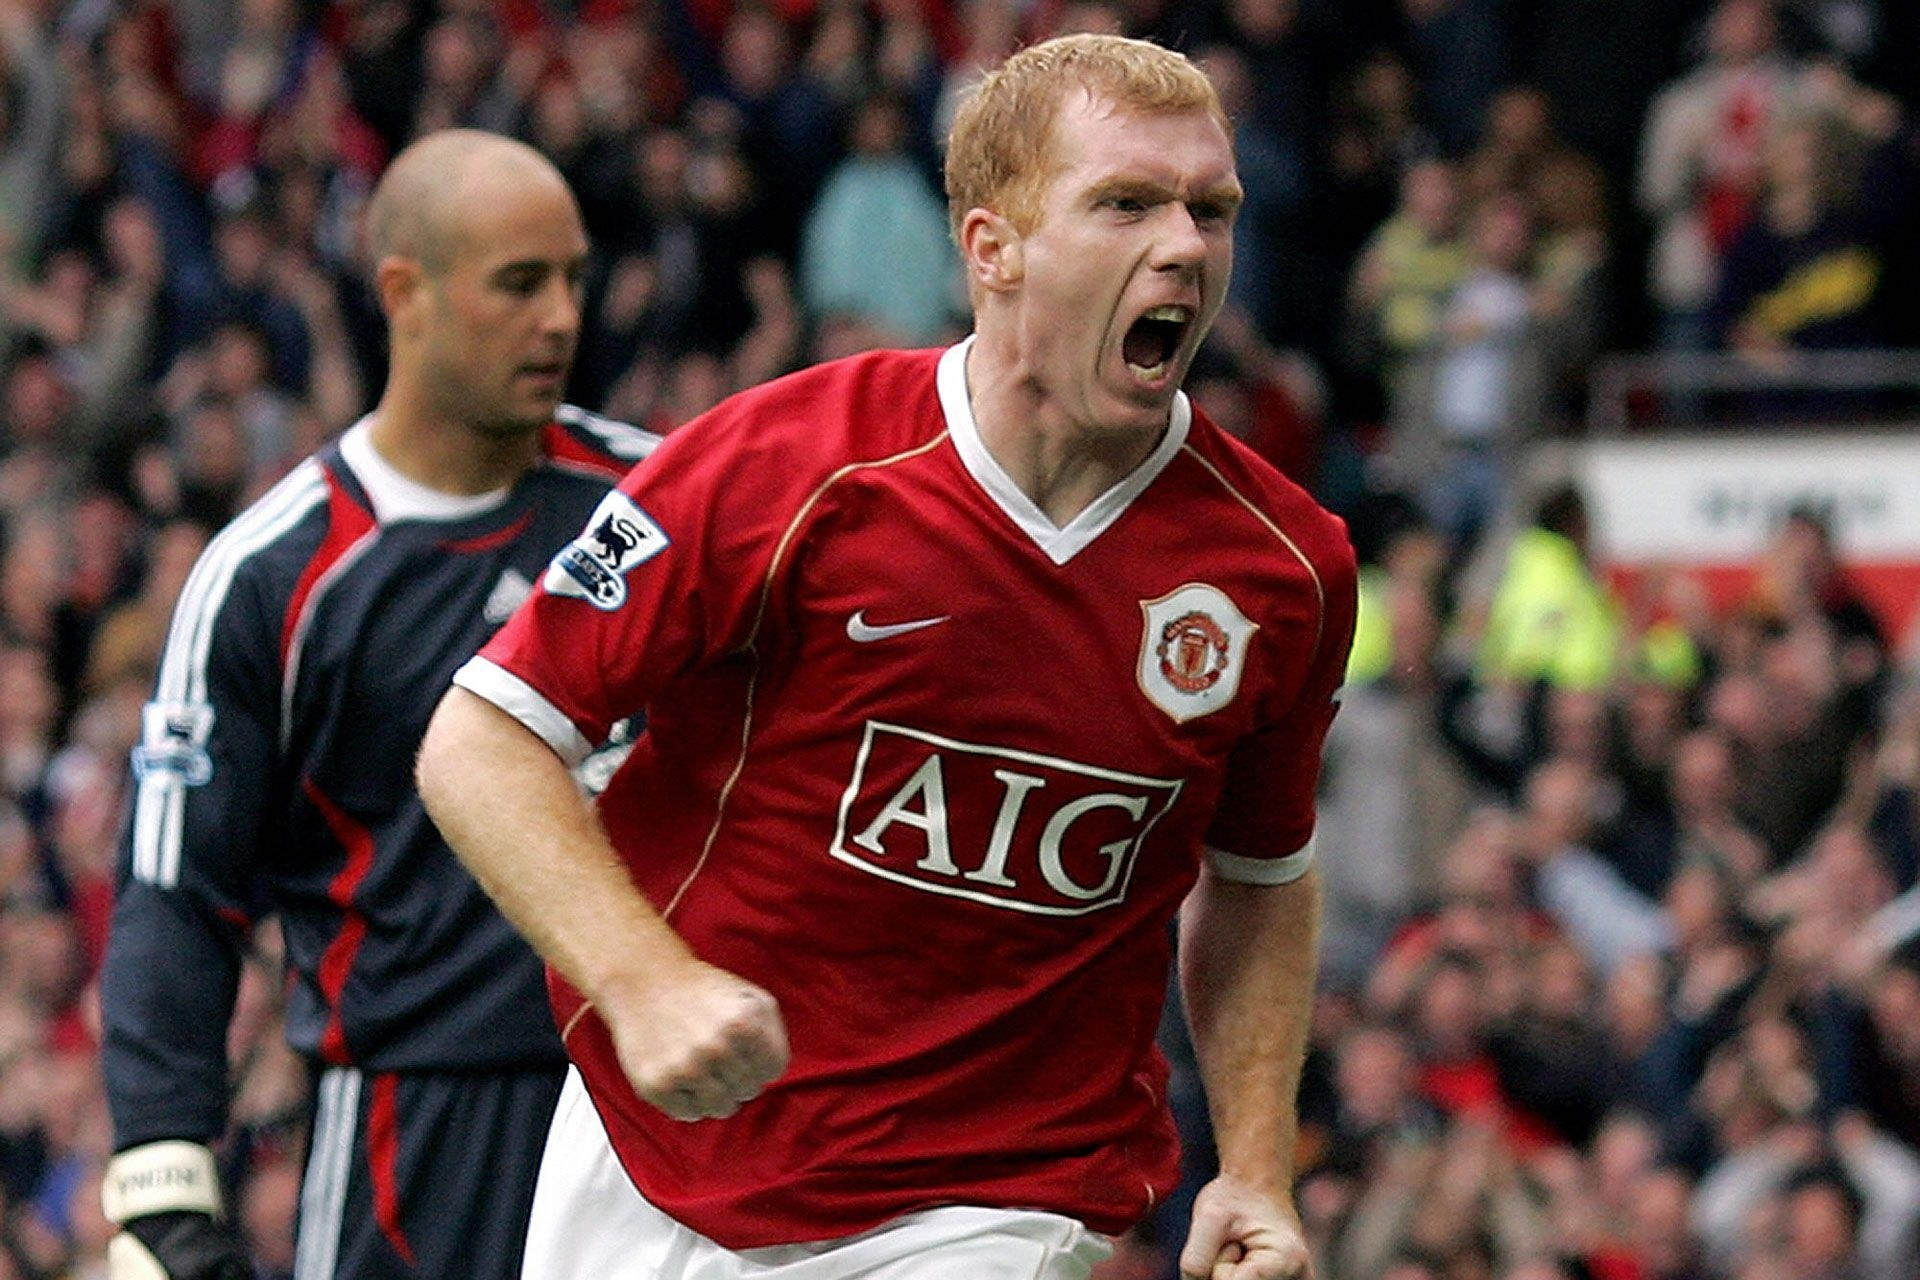 Manchester United-Premier League-England-Red Devils-منچستریونایتد-لیگ برتر-لیورپول-انگلیس